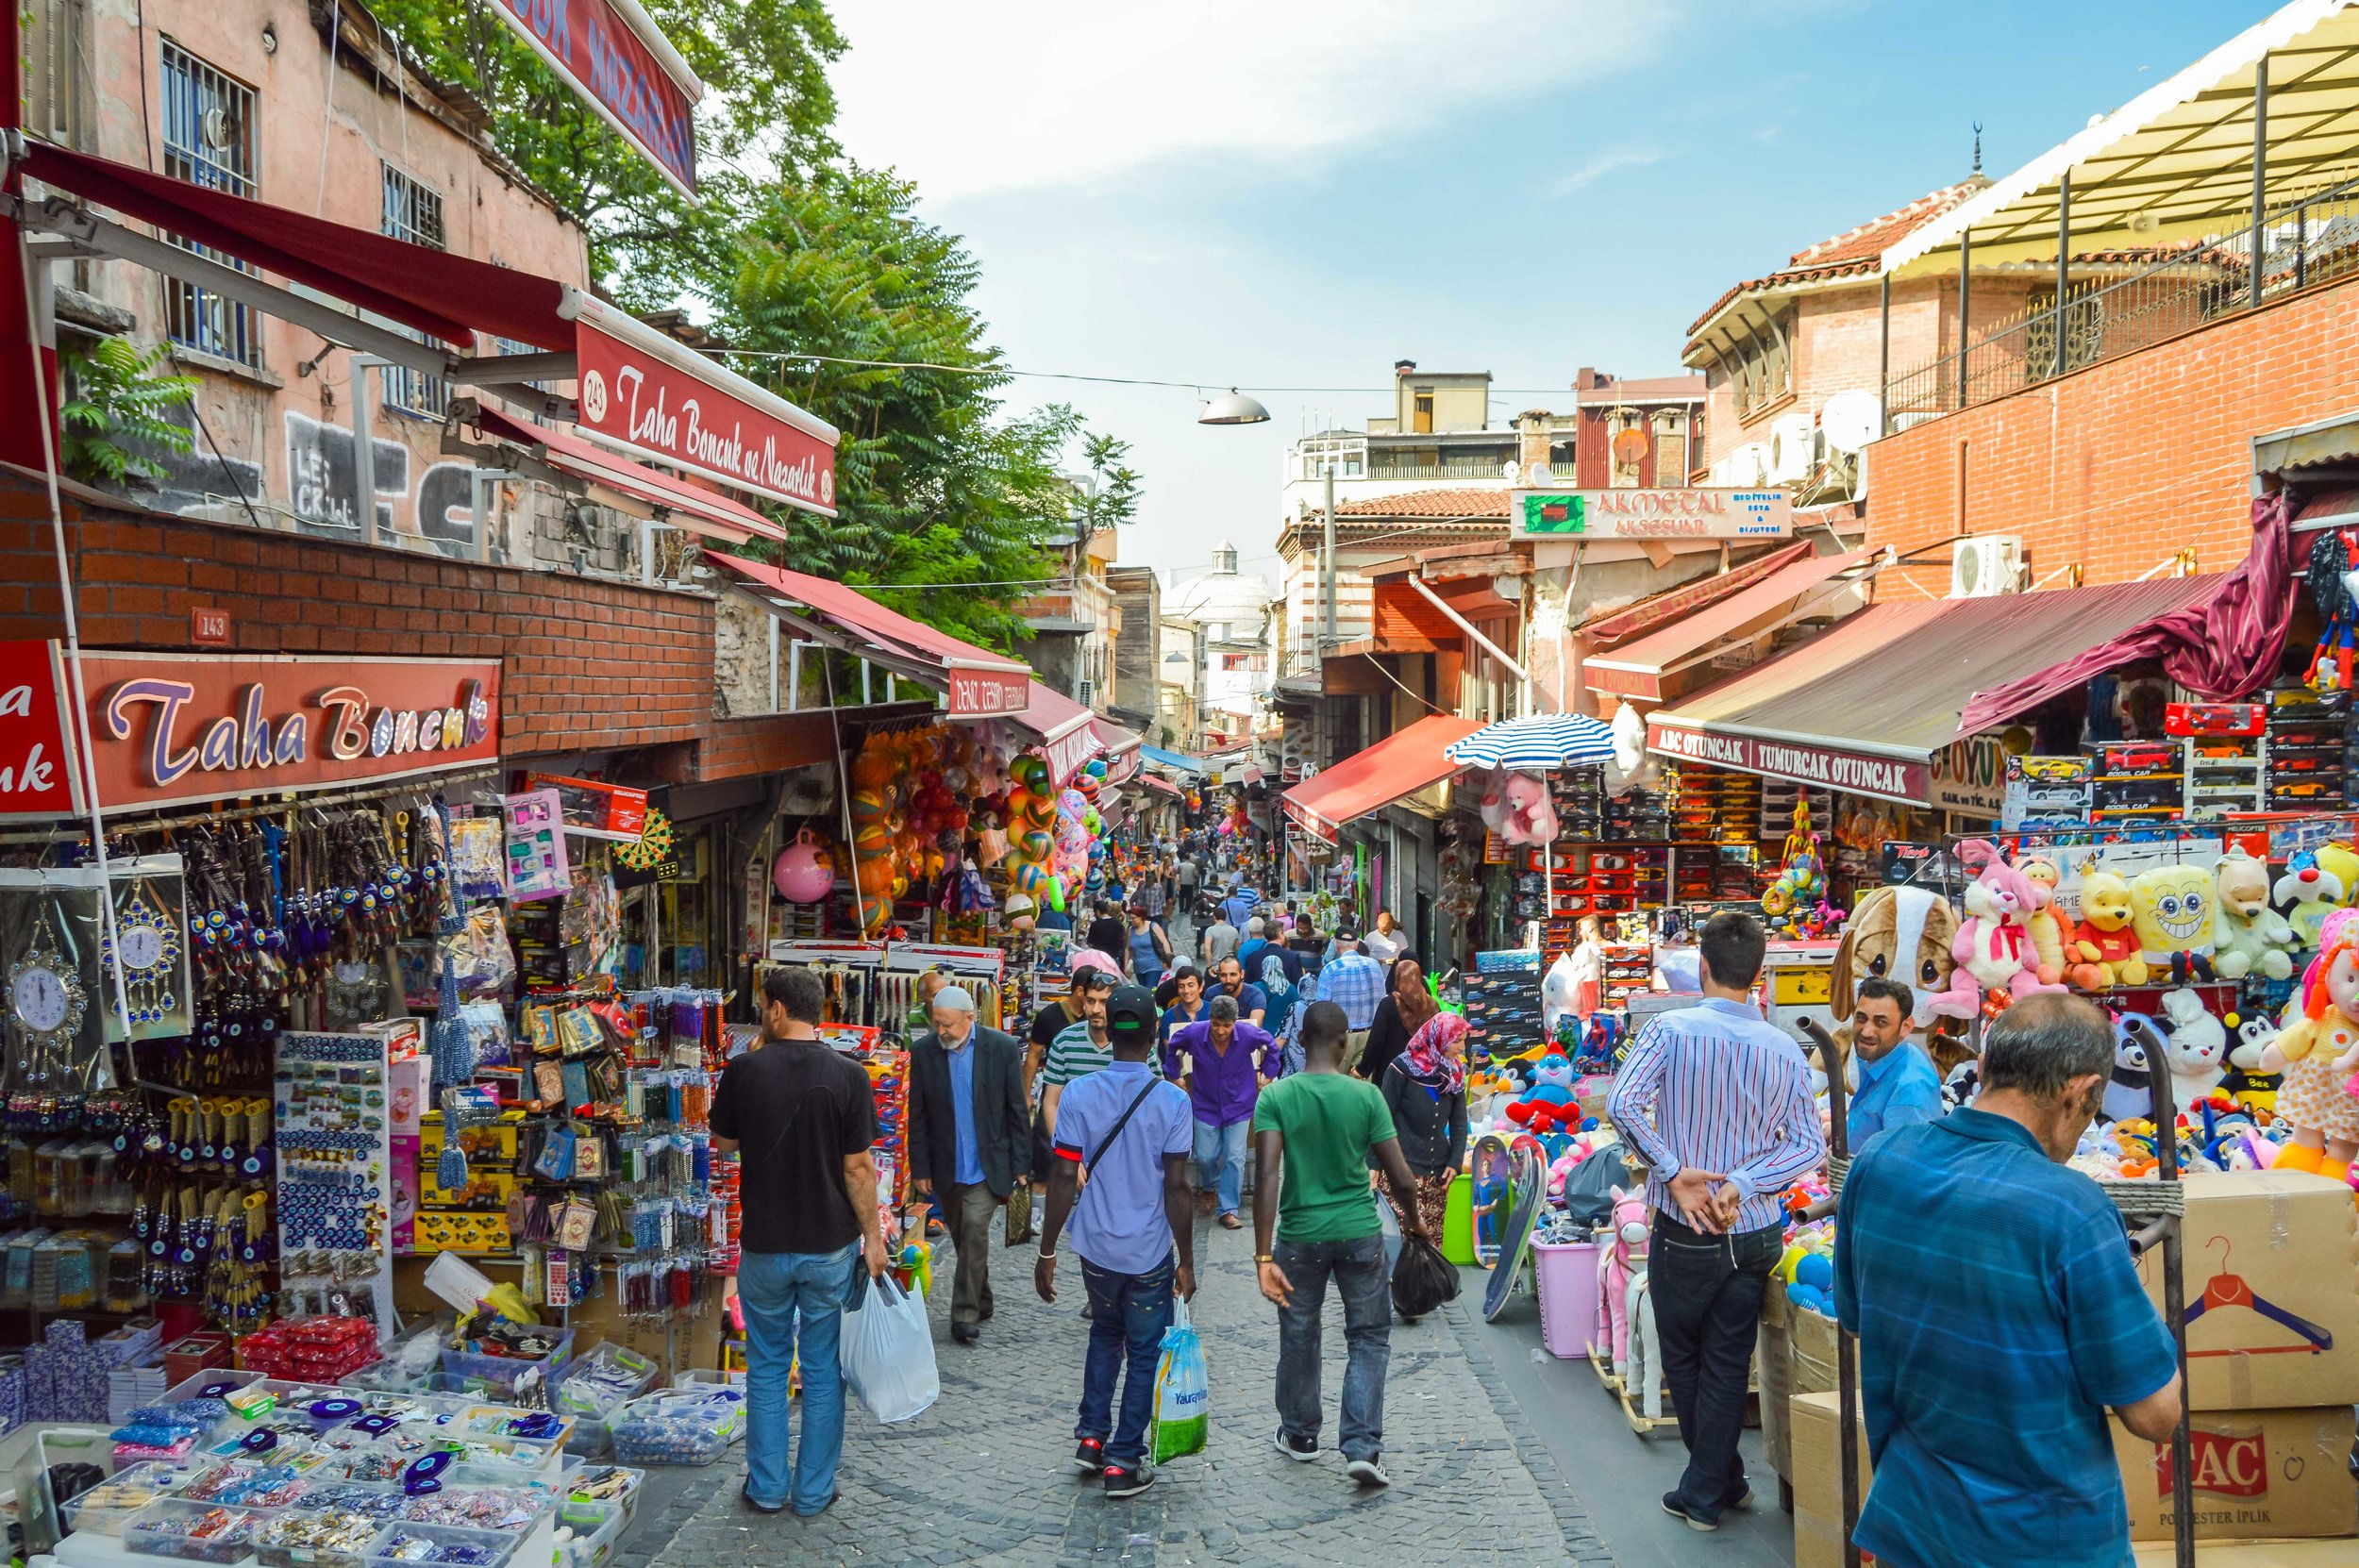 Grand Bazaar Kapalıçarşı Büyük Çarşı Muslim Ottoman Mosaic Tile Persian Empire Constantinople Architecture Istanbul Turkey